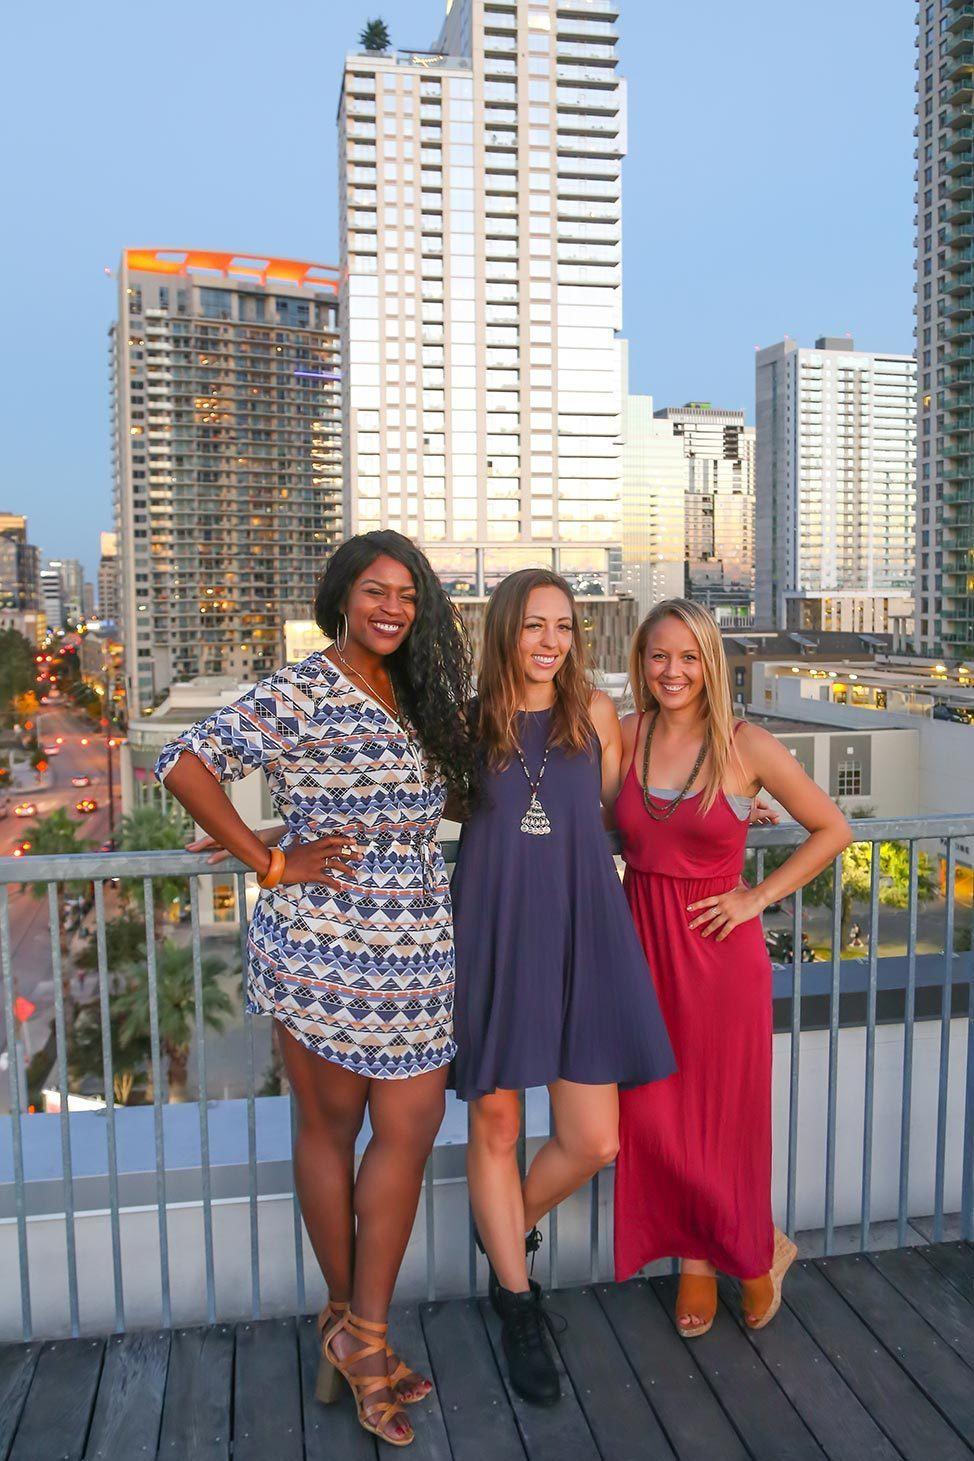 Speaking at TravelCon Austin 2018